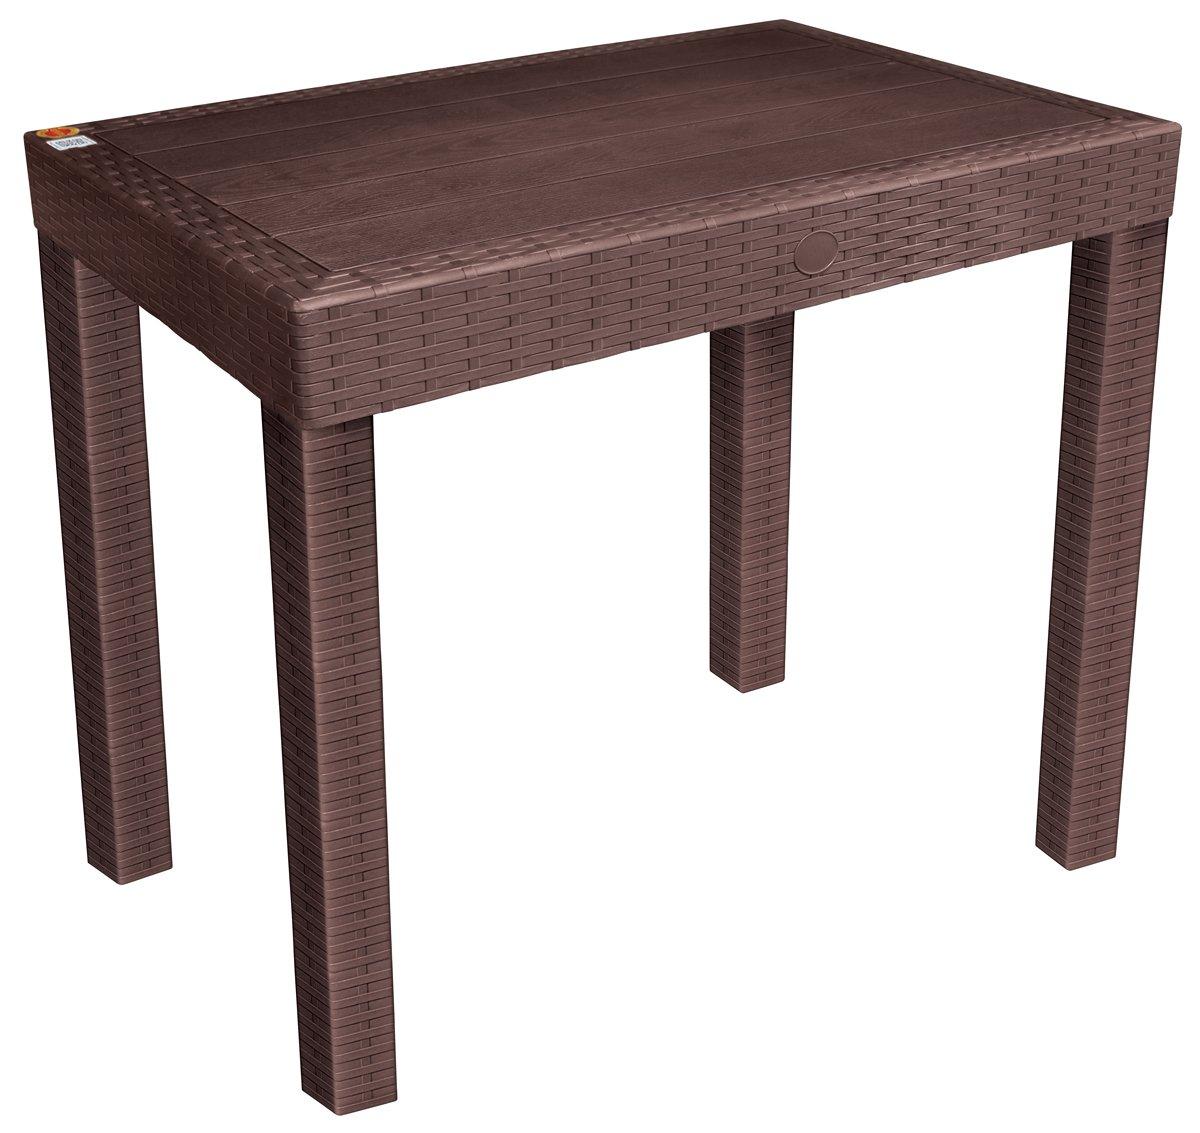 Avon Furniture Nexa Plastic Table Brown Amazon In Home Kitchen